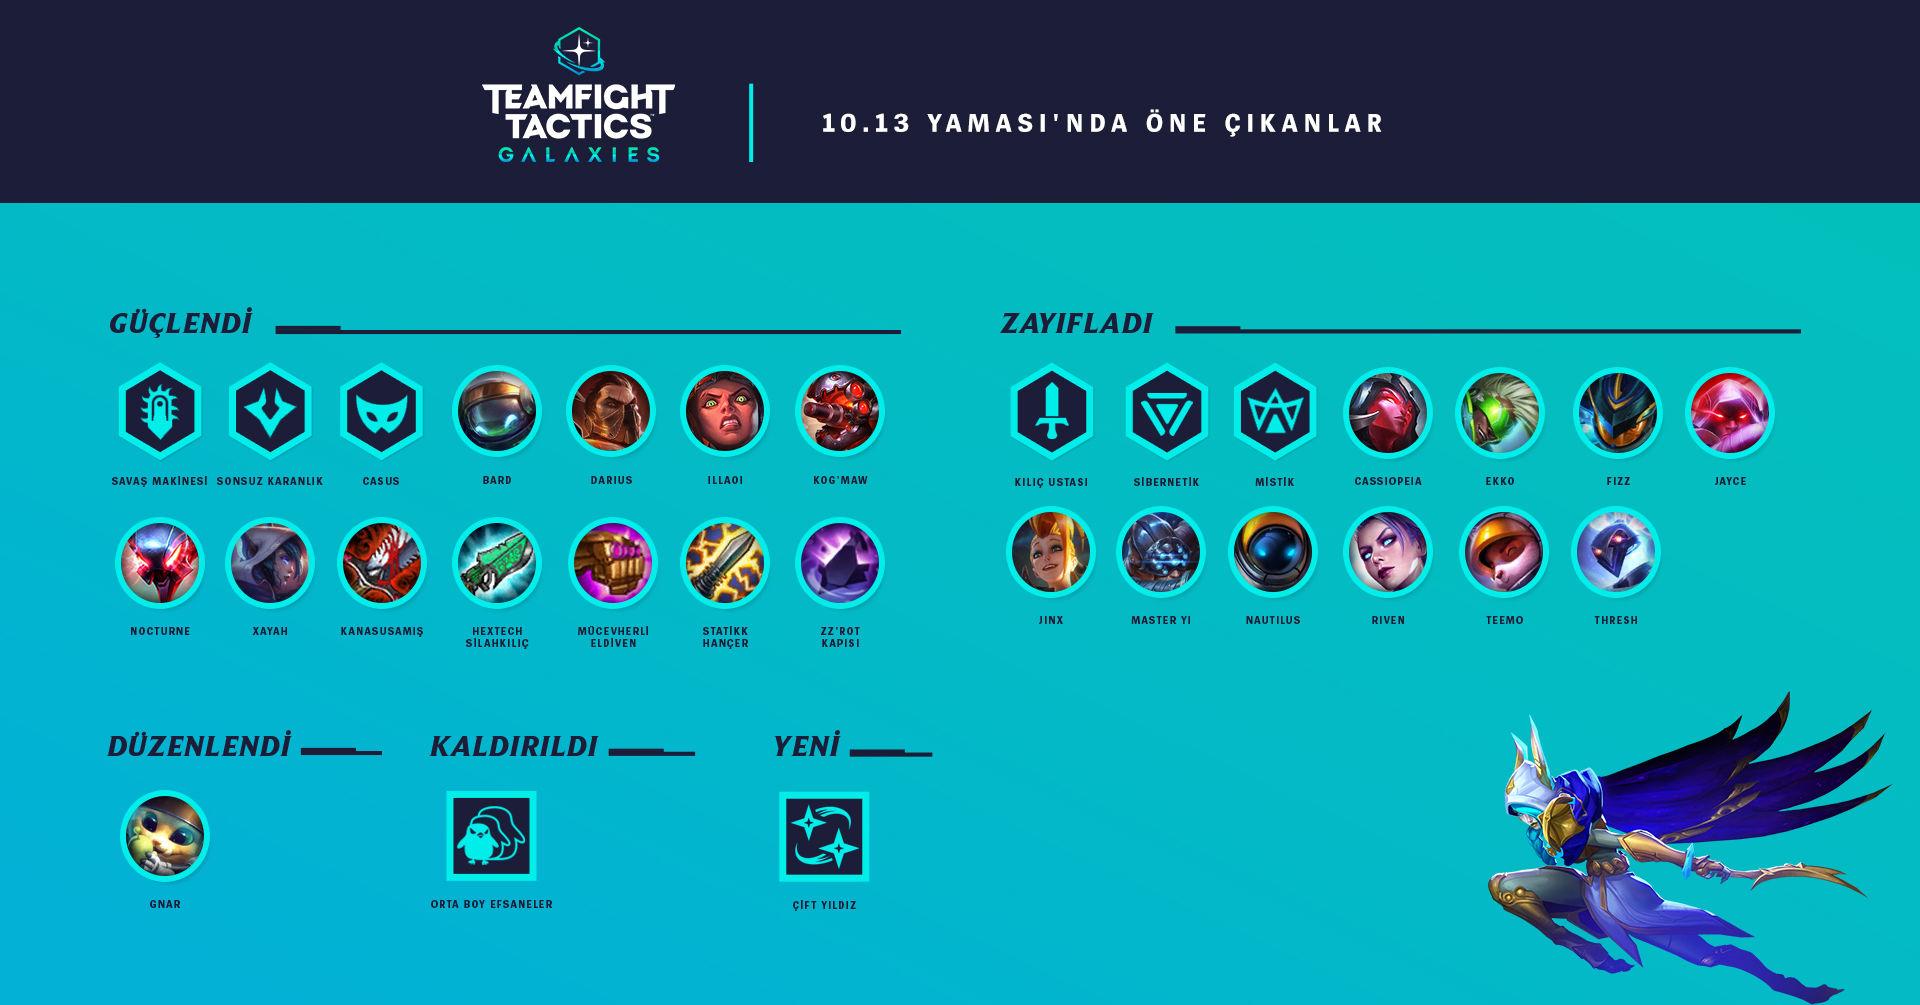 Teamfight Tactics 10.13 yama notları yayınlandı